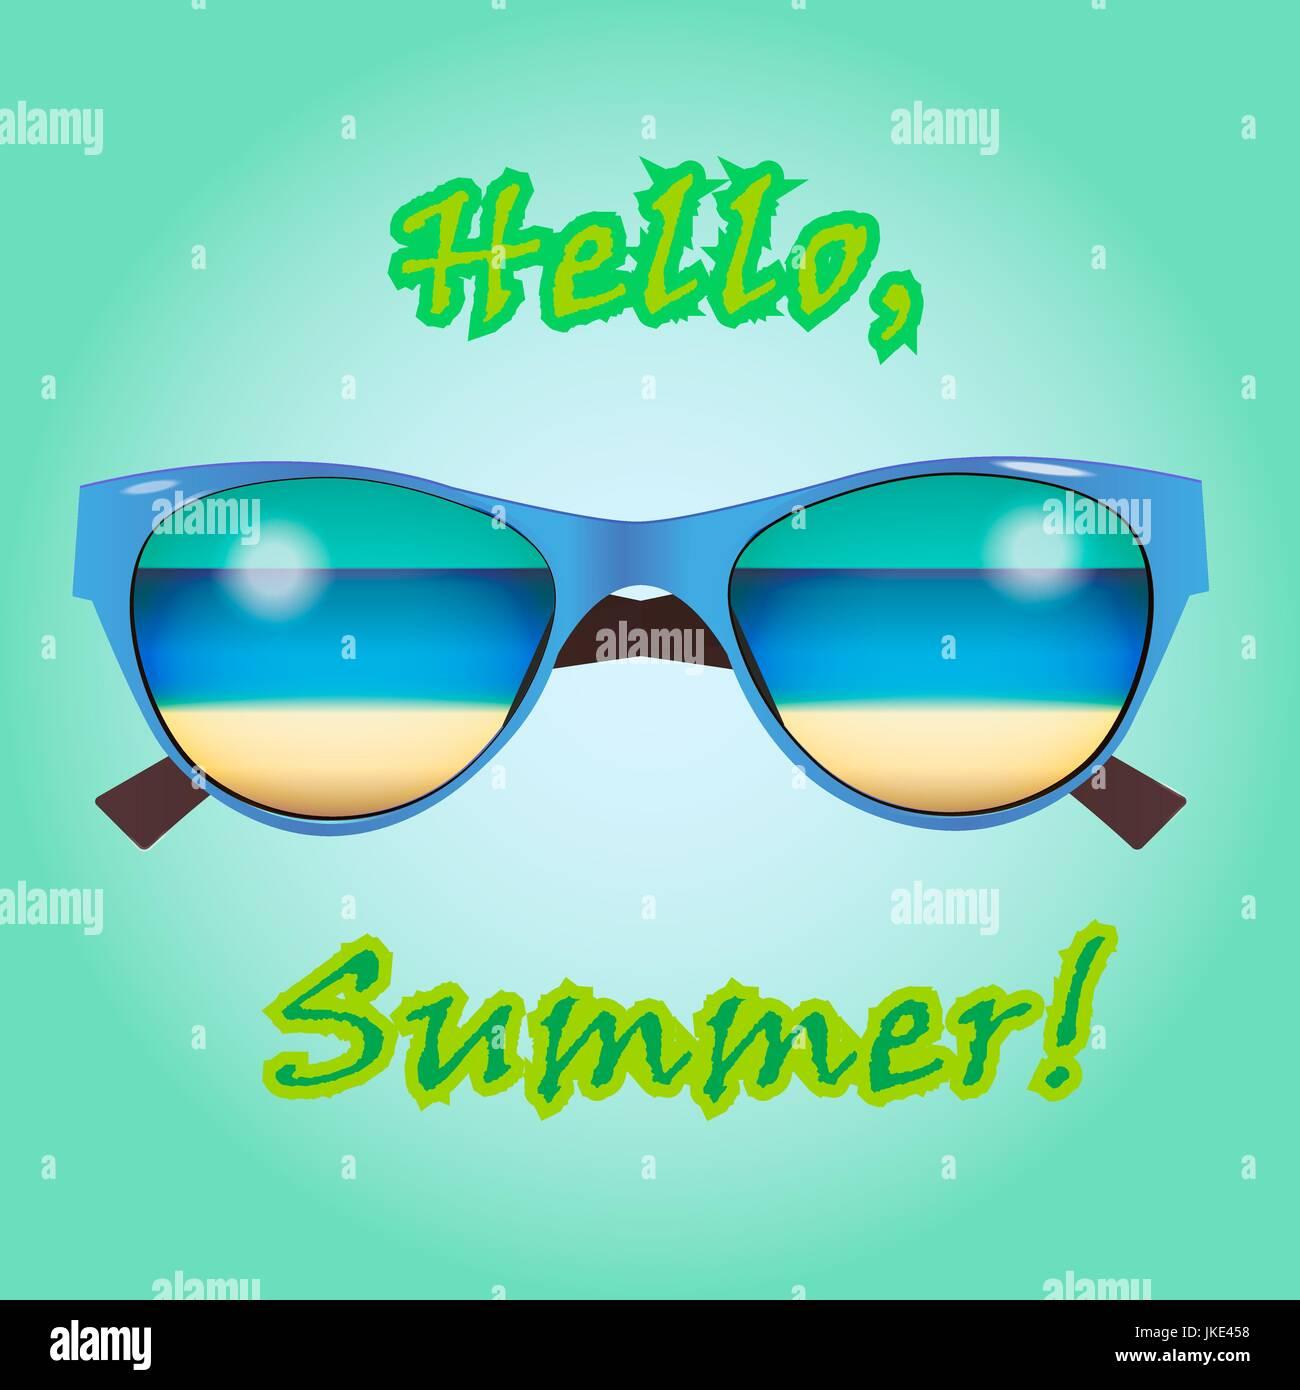 0912fa79061c Sunglasses Shop Stock Vector Images - Alamy